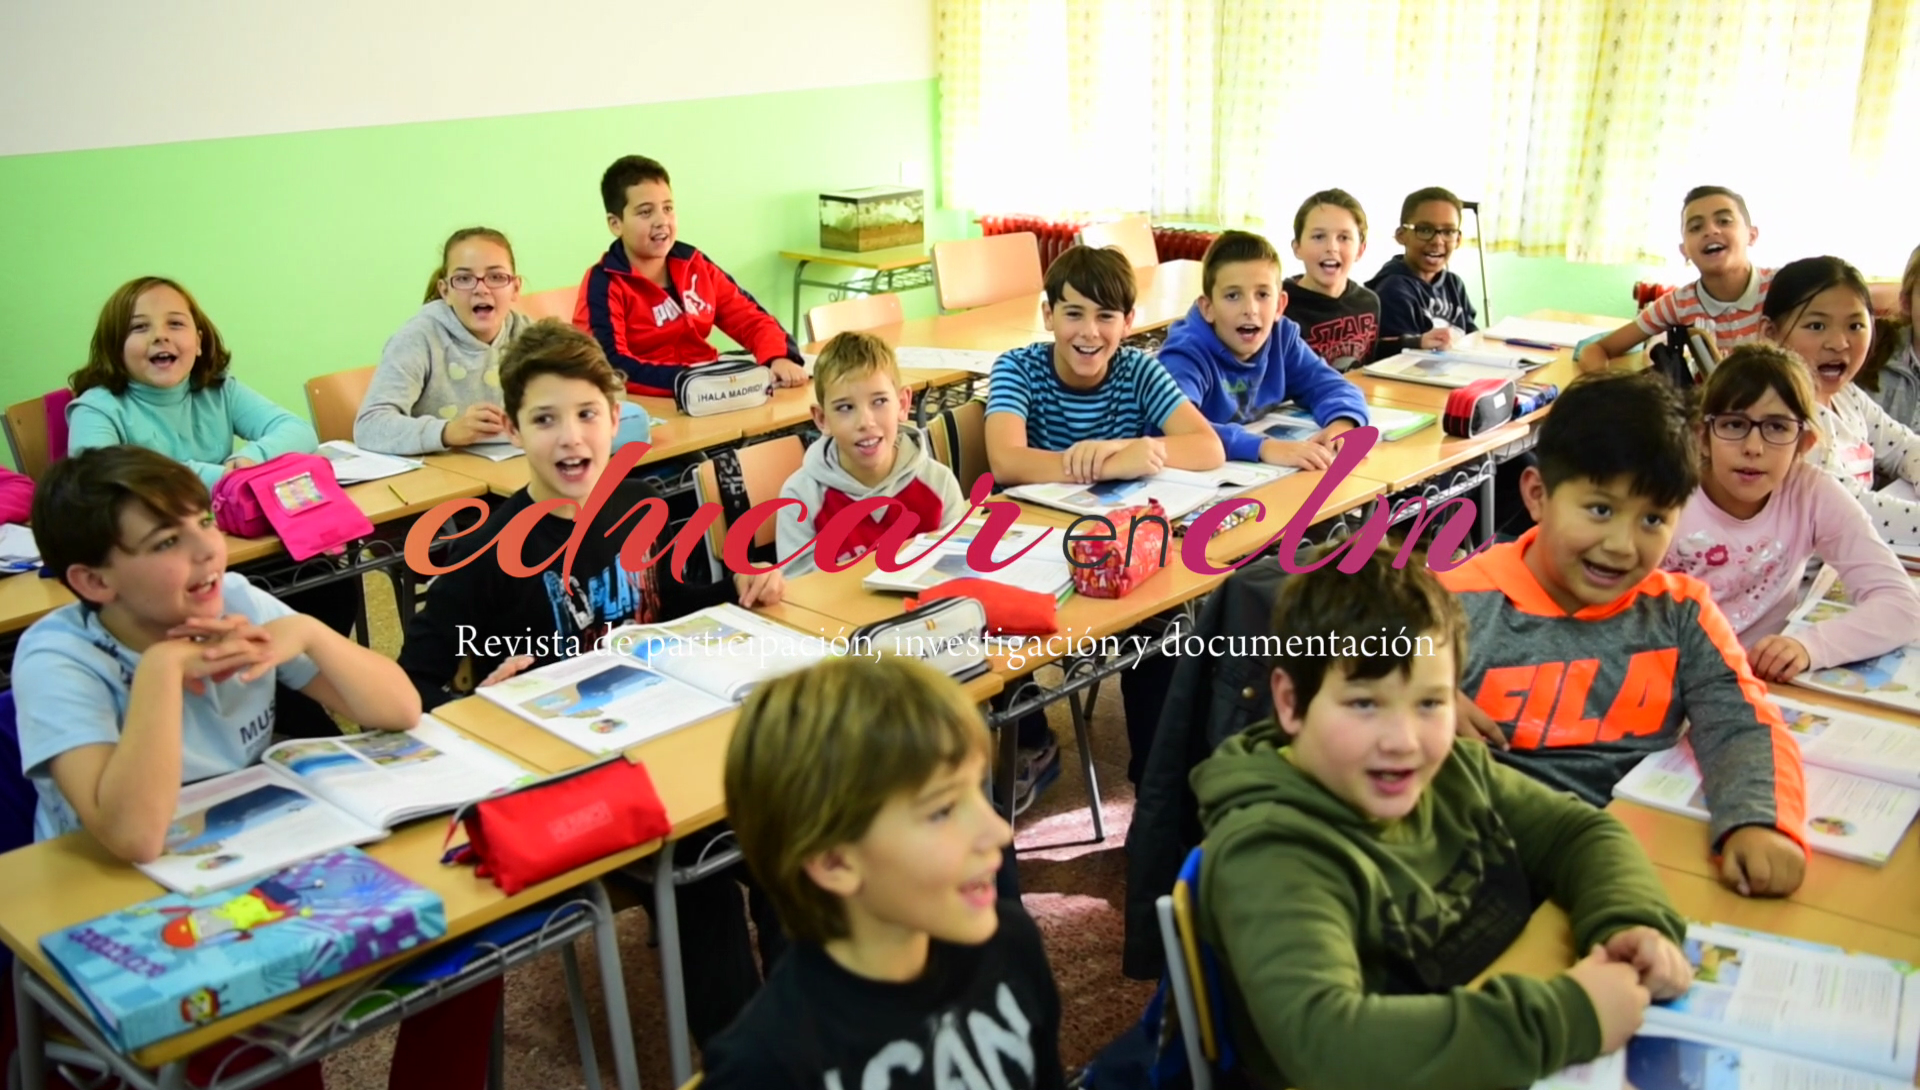 ¿Qué es EDUCARenCLM?